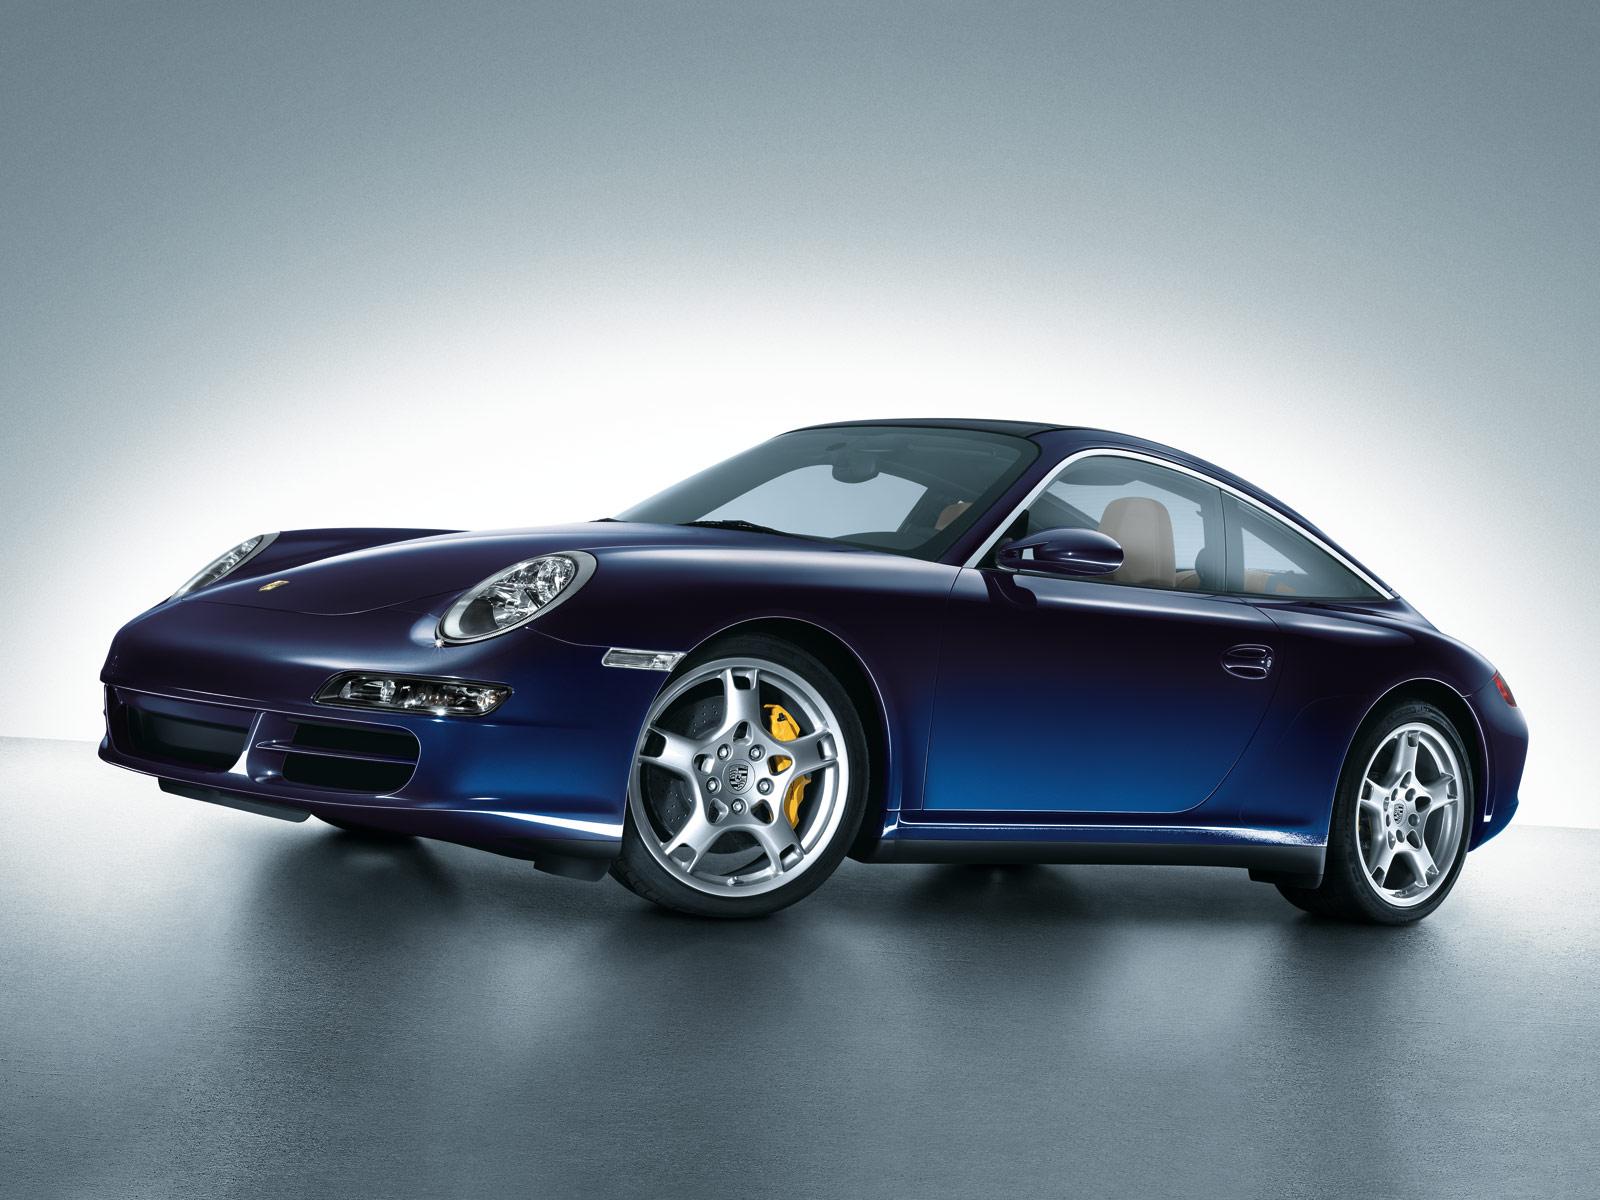 porsche 911 carrera targa 4s 997 specs photos 2006 2007 2008 autoevolution. Black Bedroom Furniture Sets. Home Design Ideas